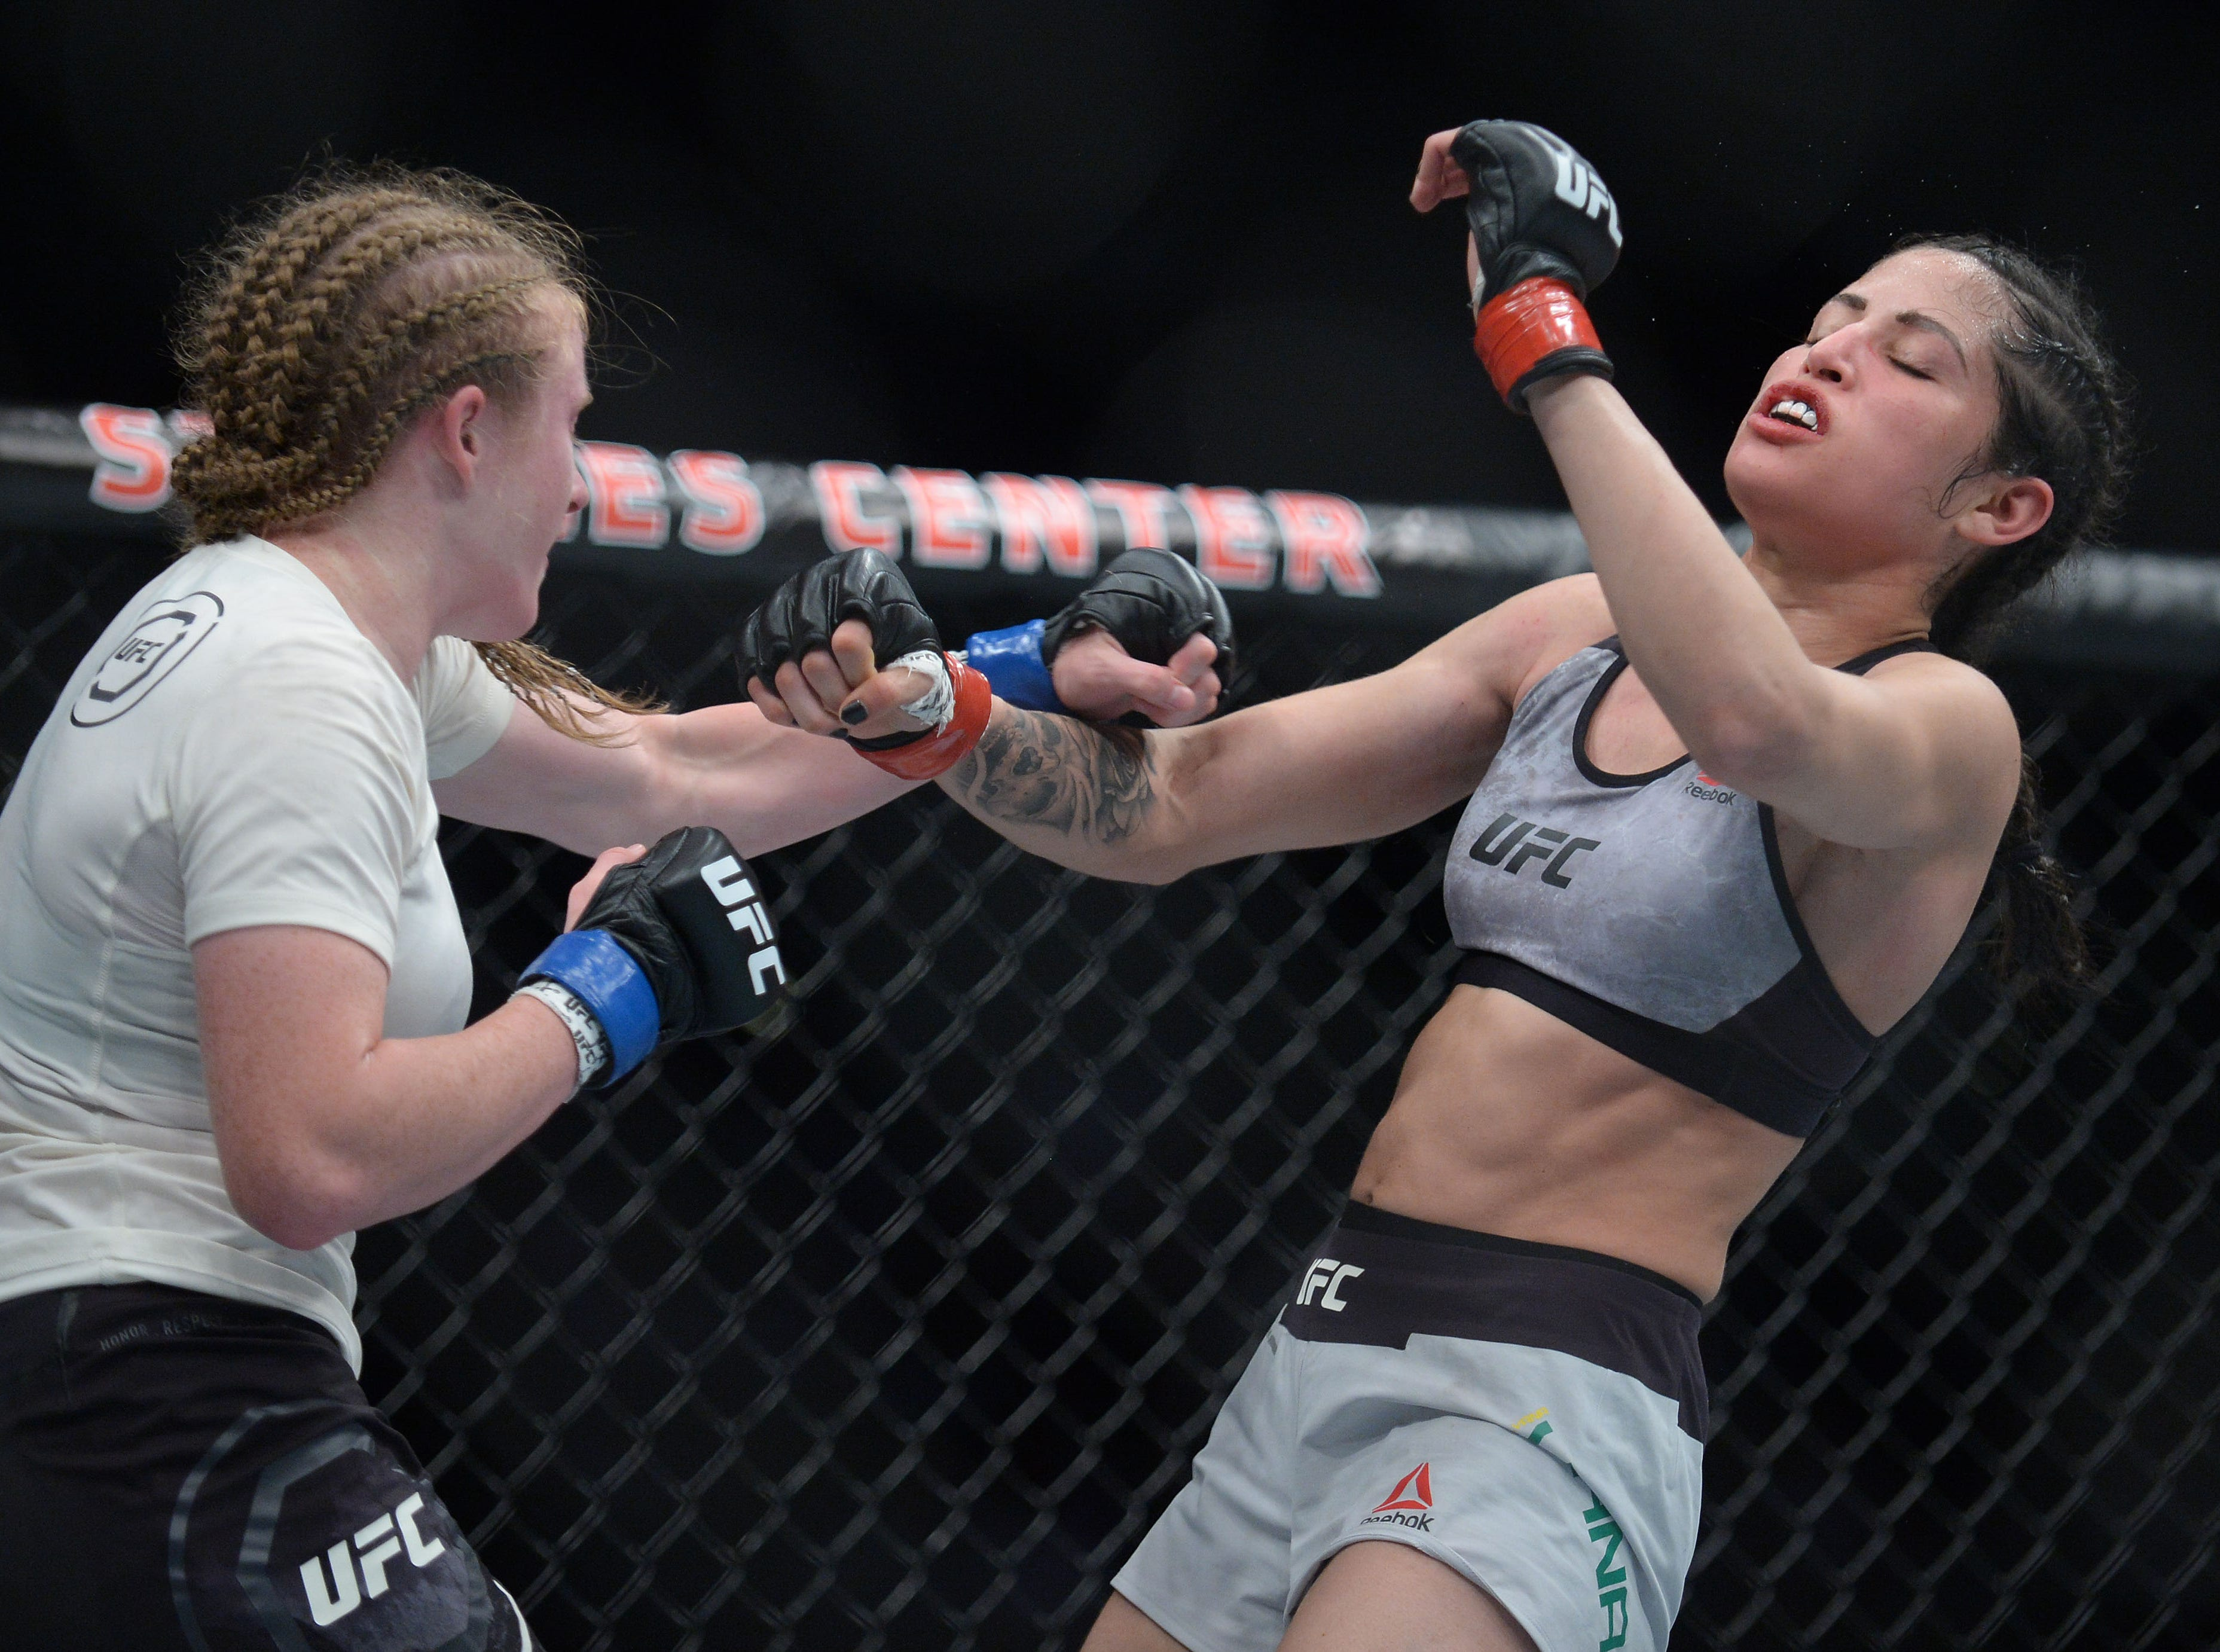 JJ Aldrich lands a hit against Polyana Viana during UFC 227 at Staples Center.